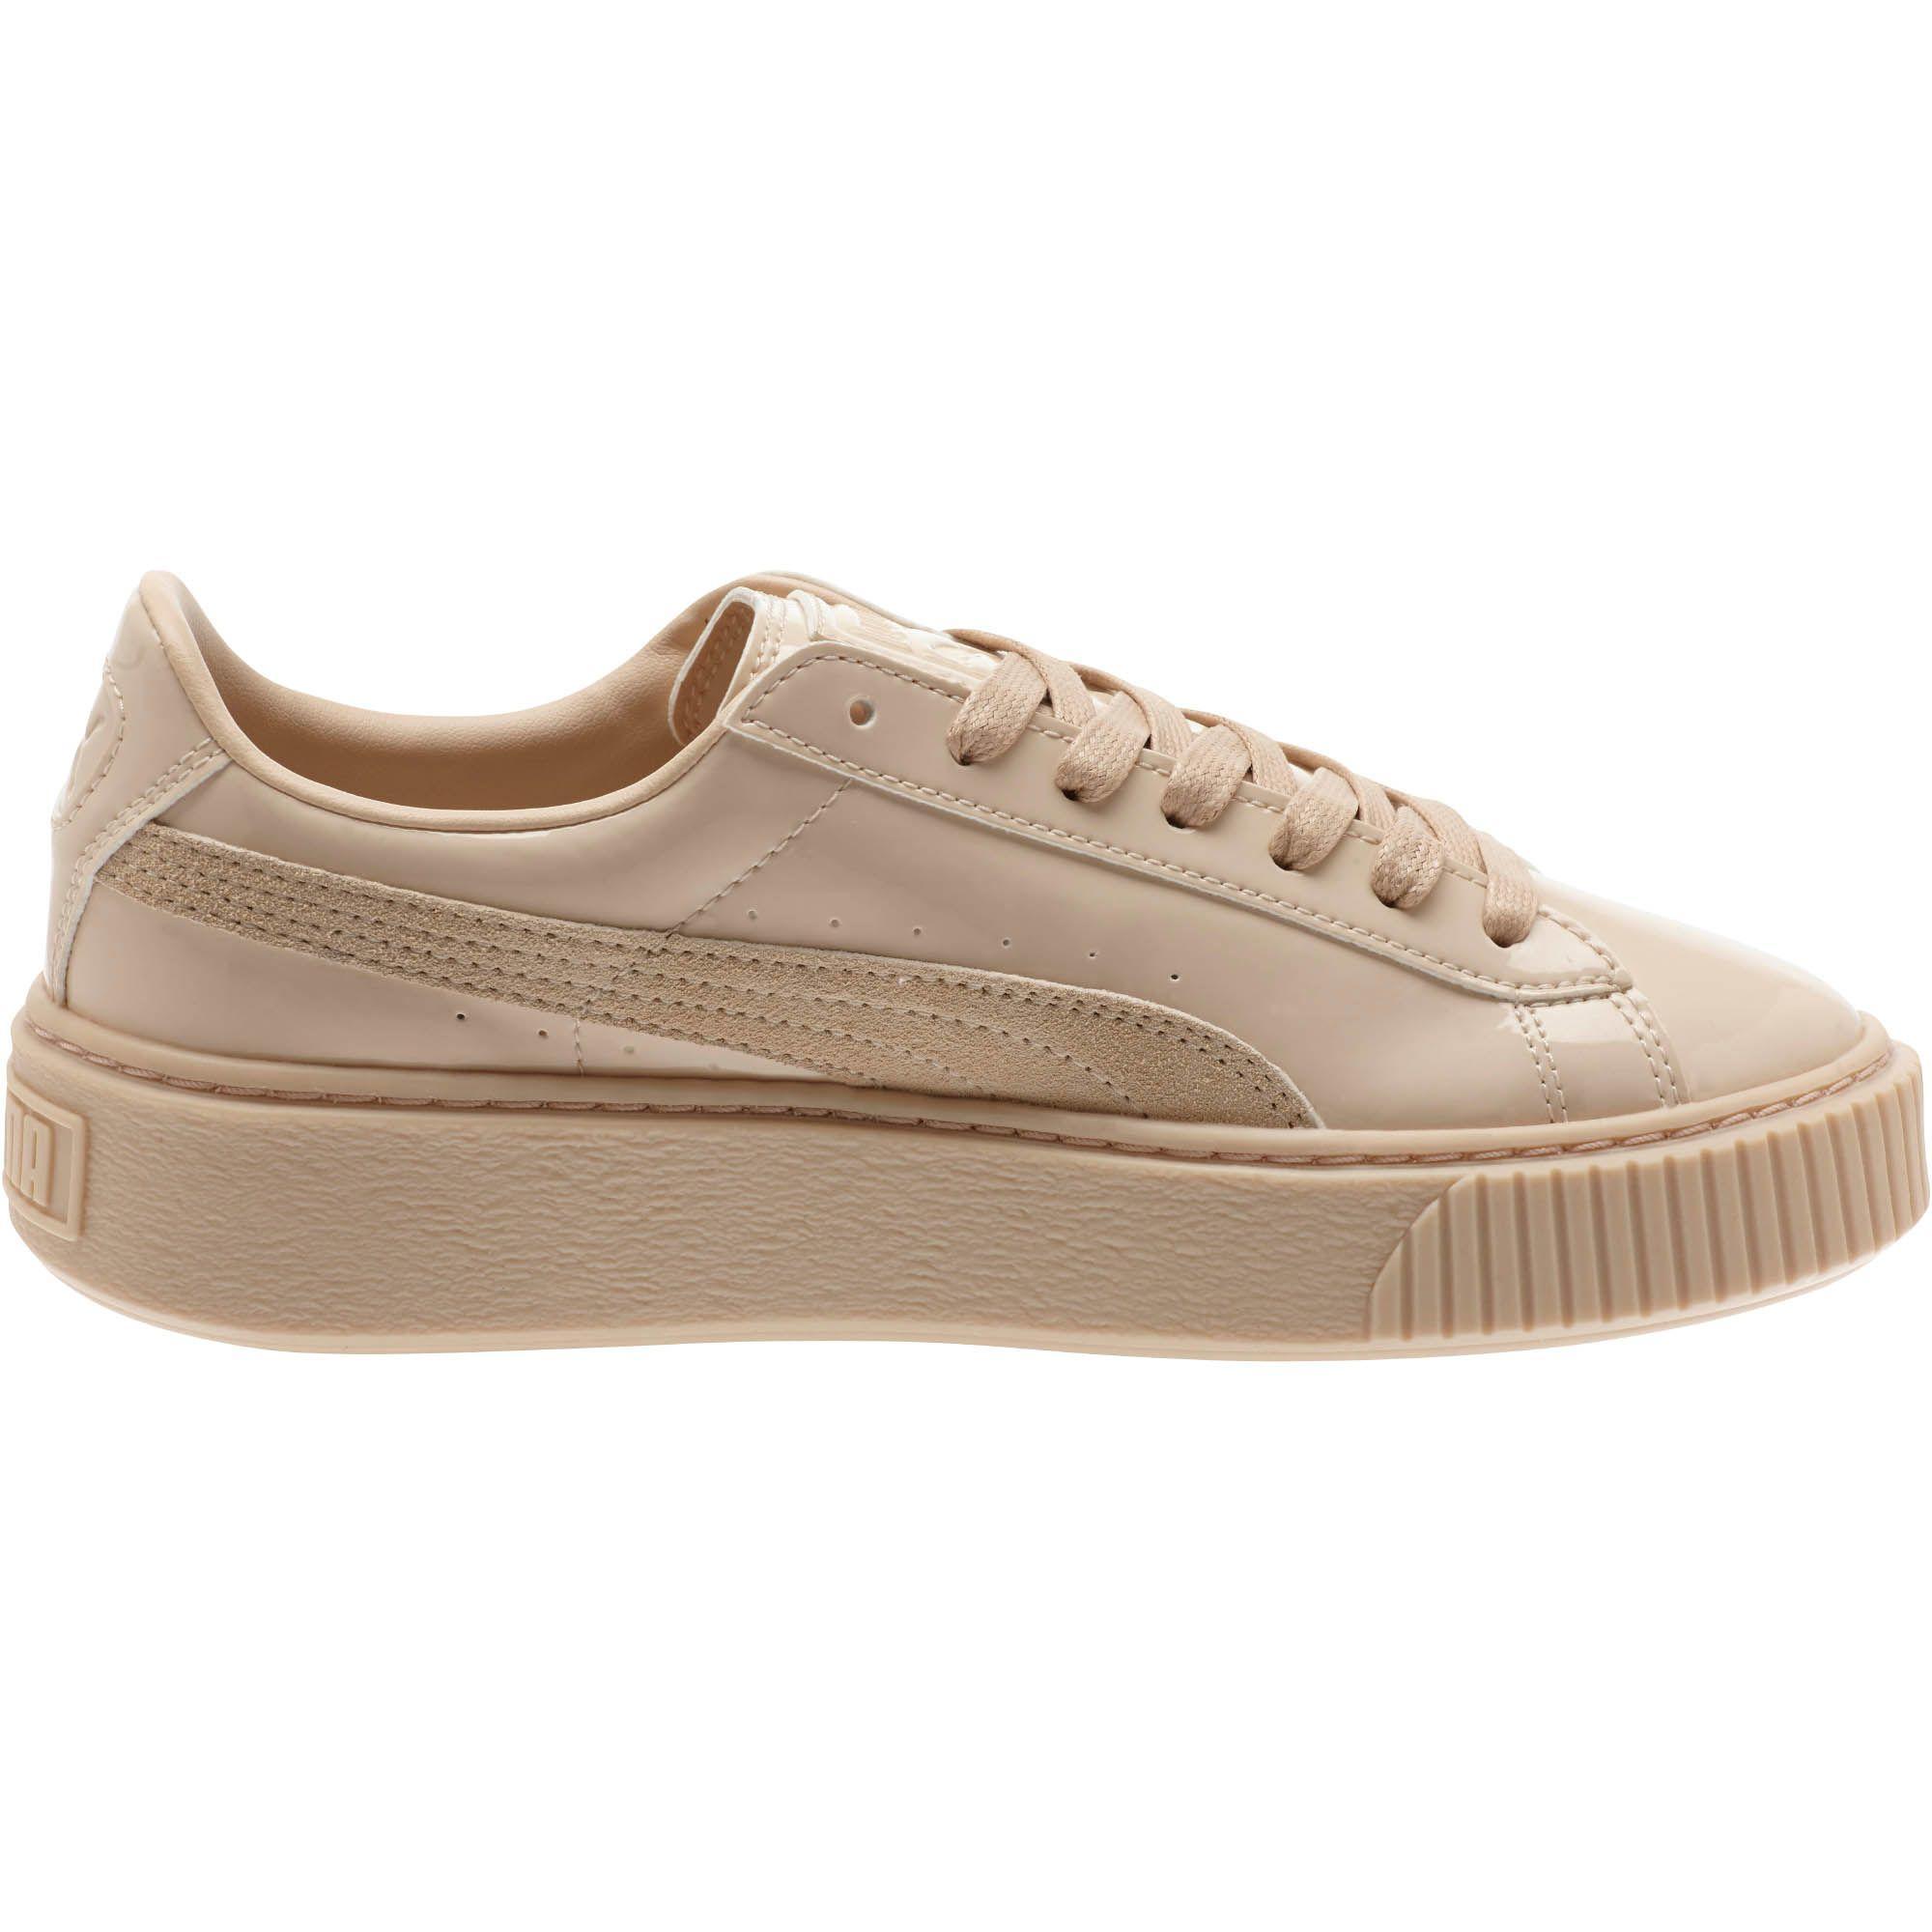 Puma Basket Patent Leather Platform Sneaker